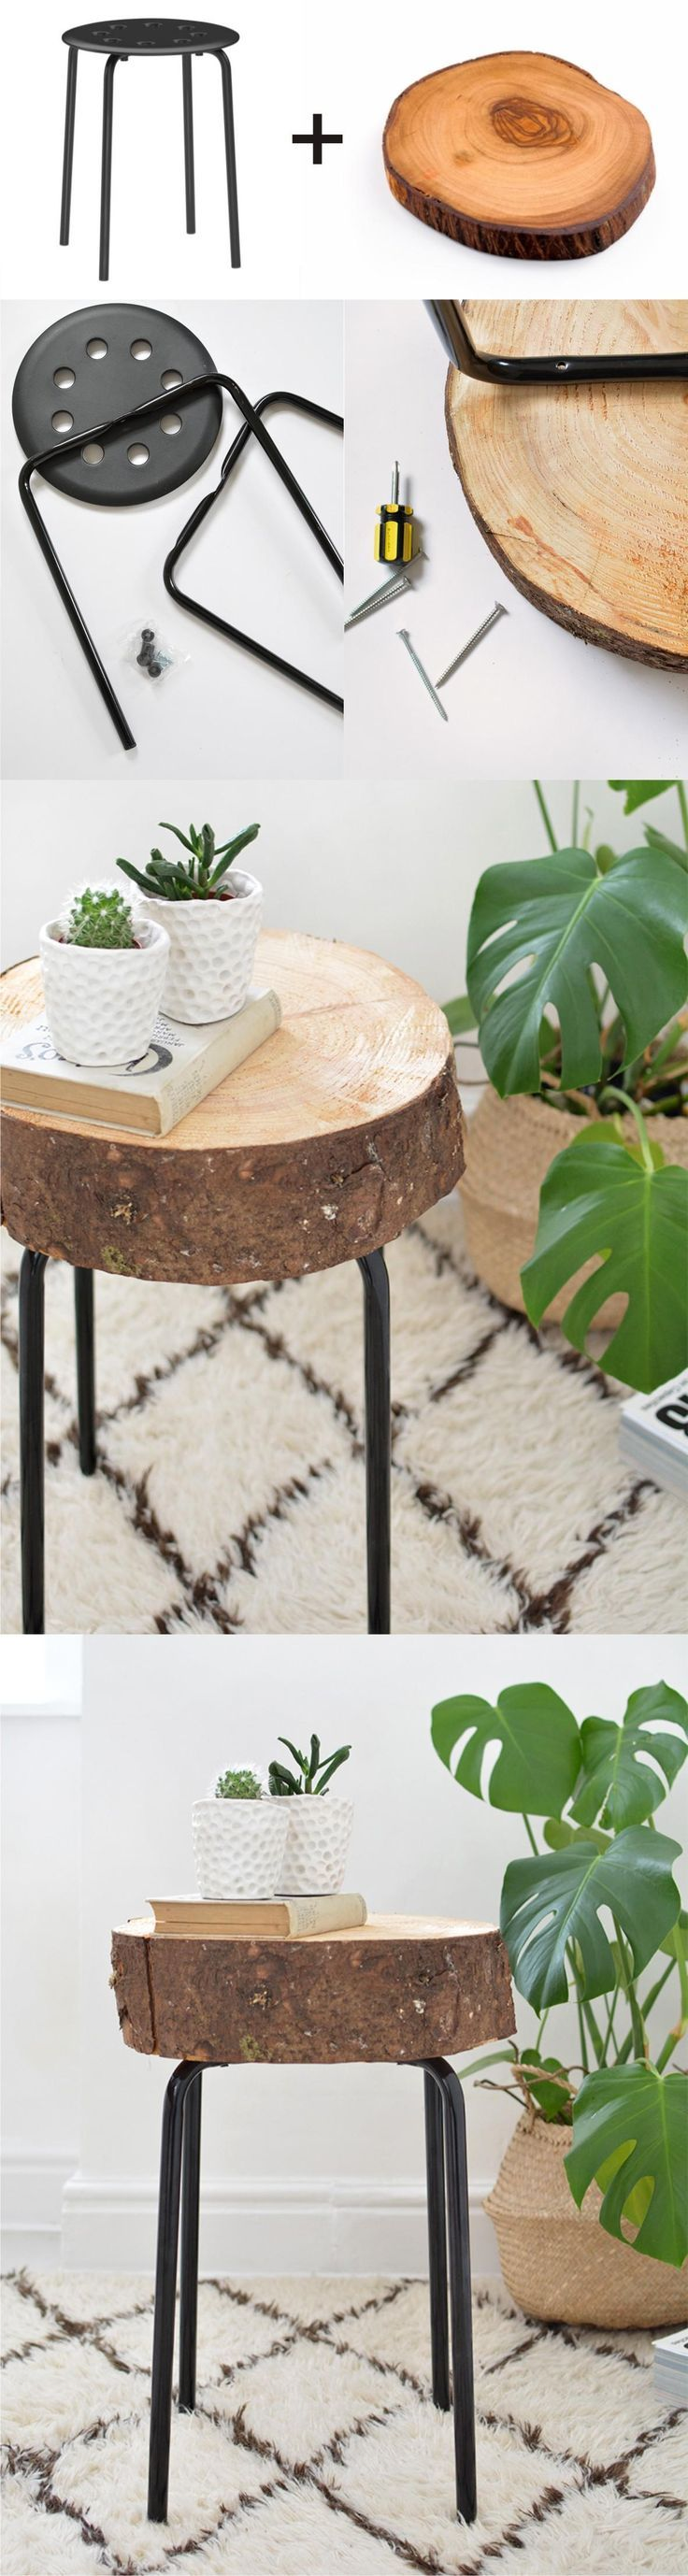 Wooden Stool Ikea Hack